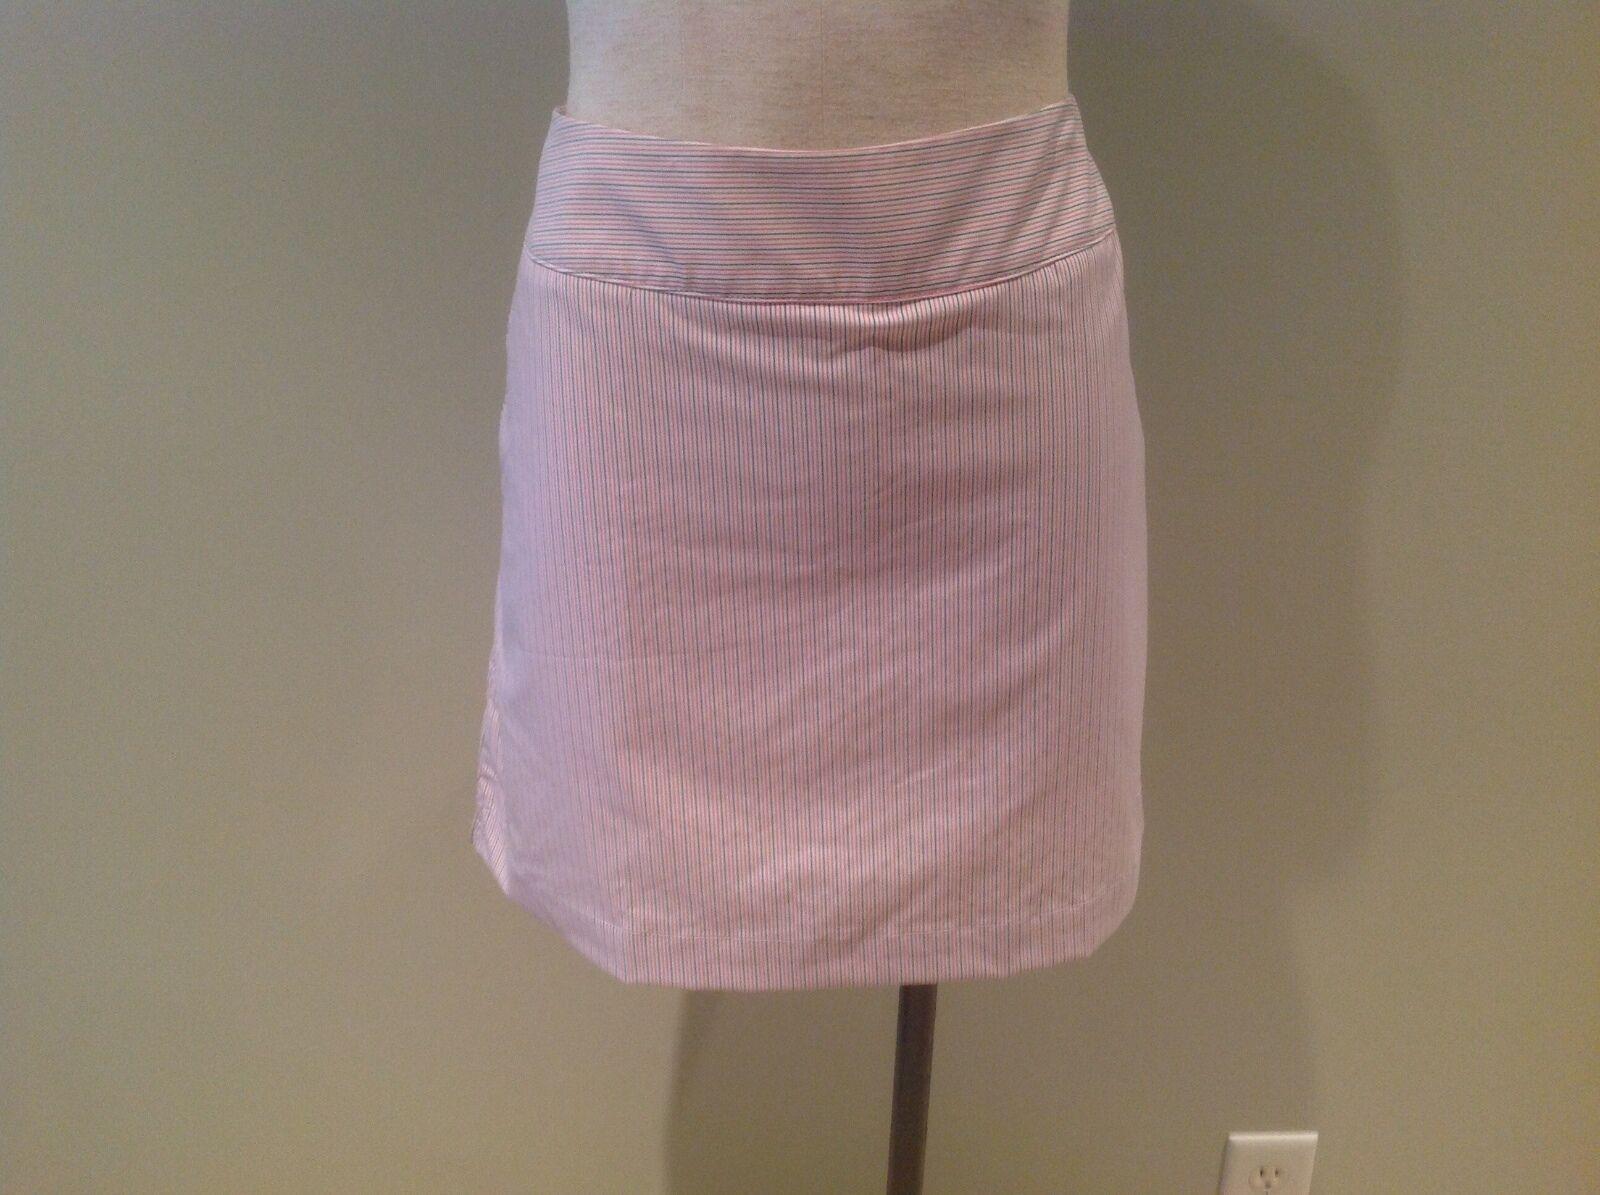 Adidas Climacool Pinstripe Stripe Skort Skirt New 8 Red White bluee